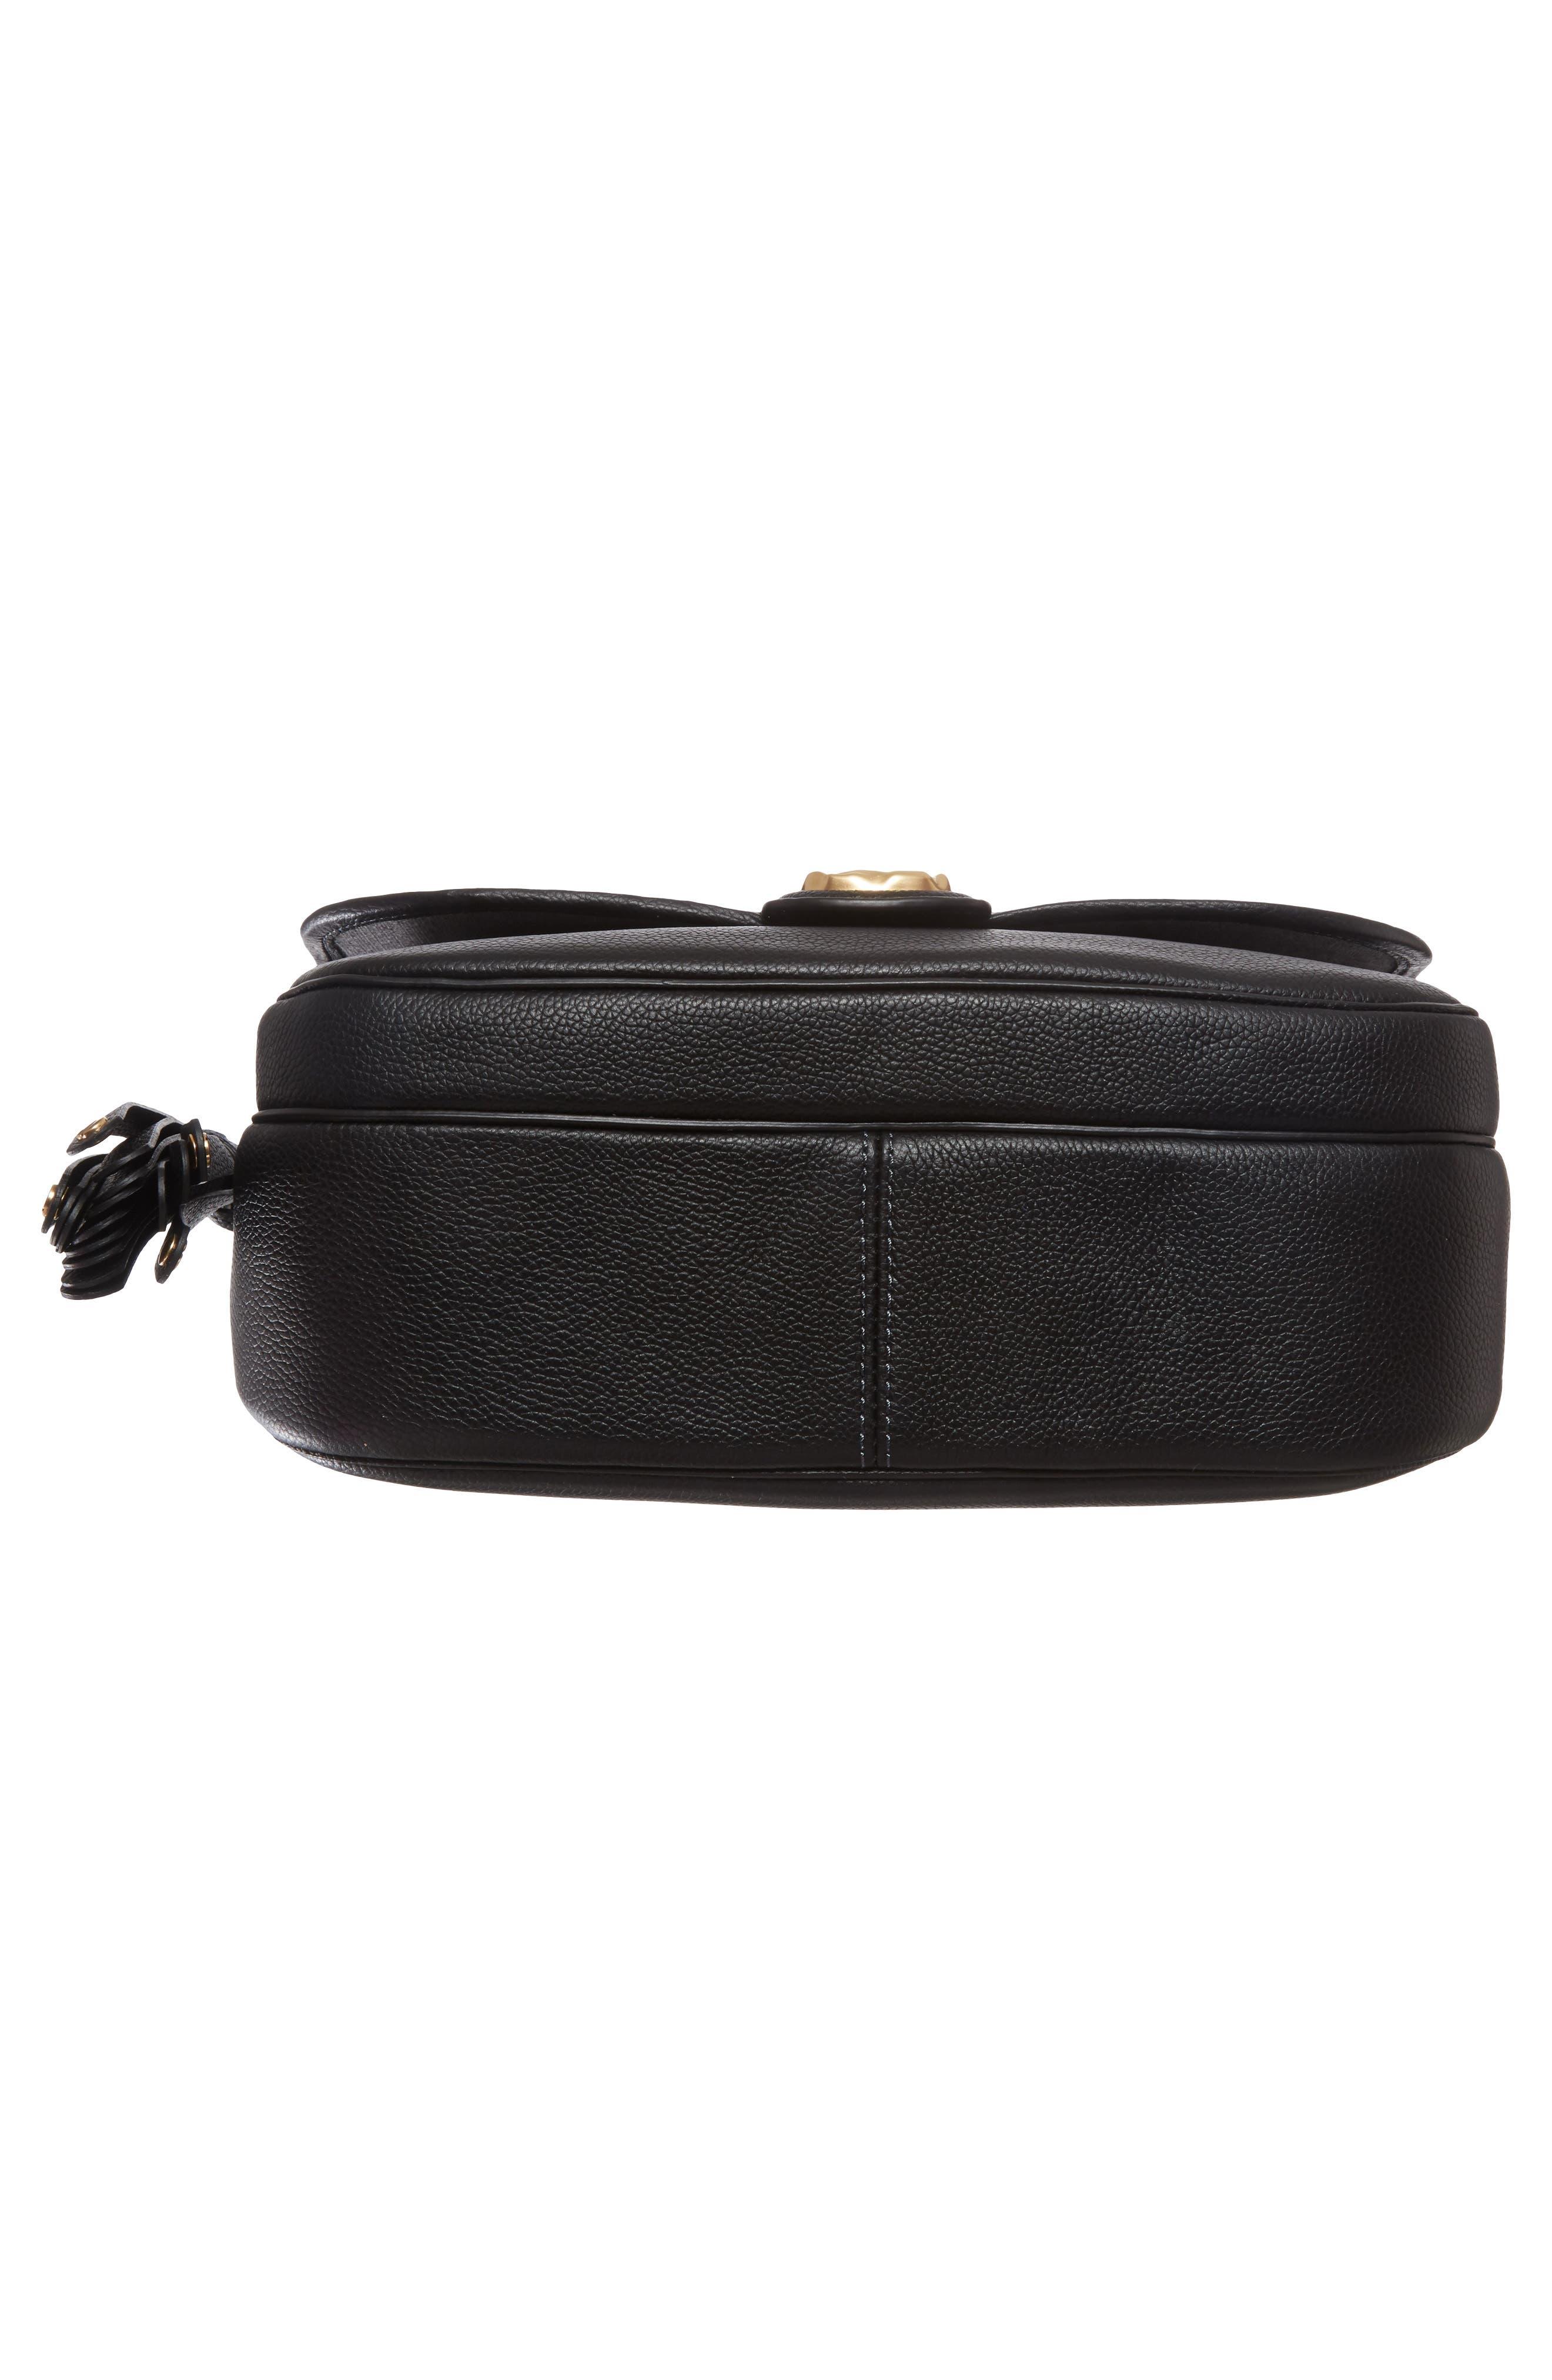 Interlock Leather Crossbody Bag,                             Alternate thumbnail 6, color,                             001